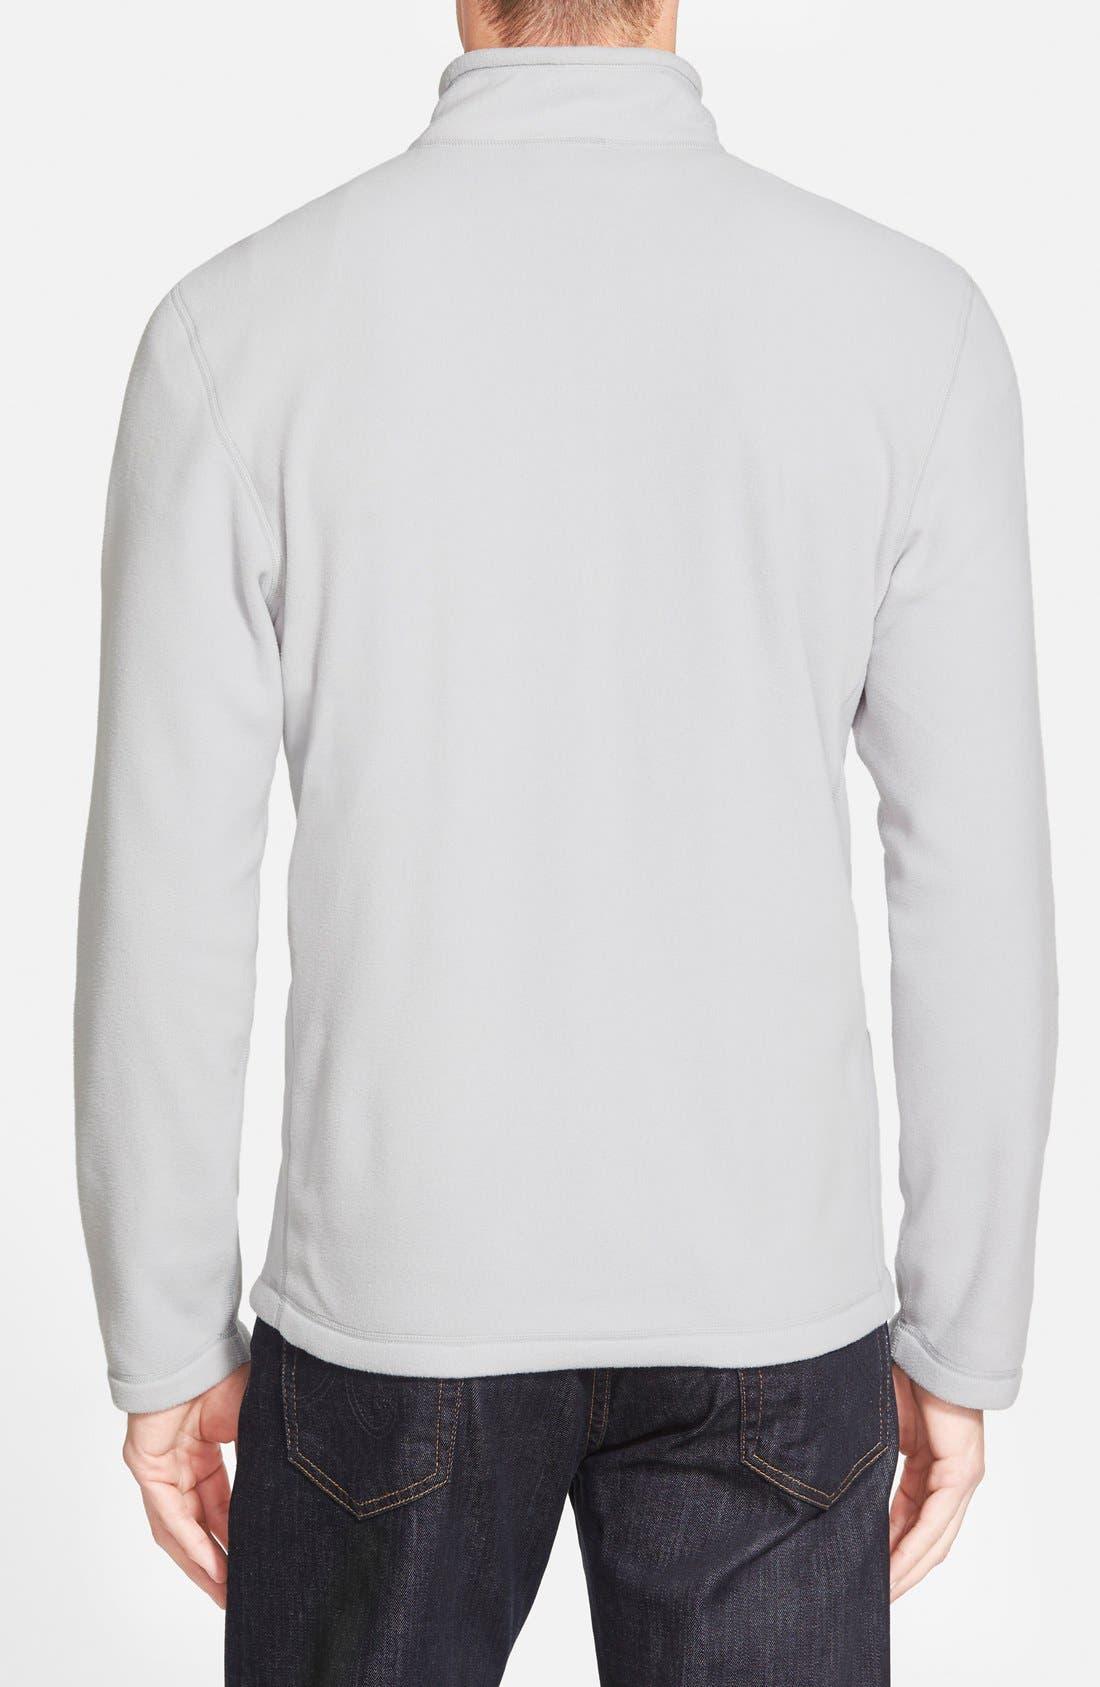 'TKA 100 Glacier' Quarter Zip Fleece Pullover,                             Alternate thumbnail 65, color,